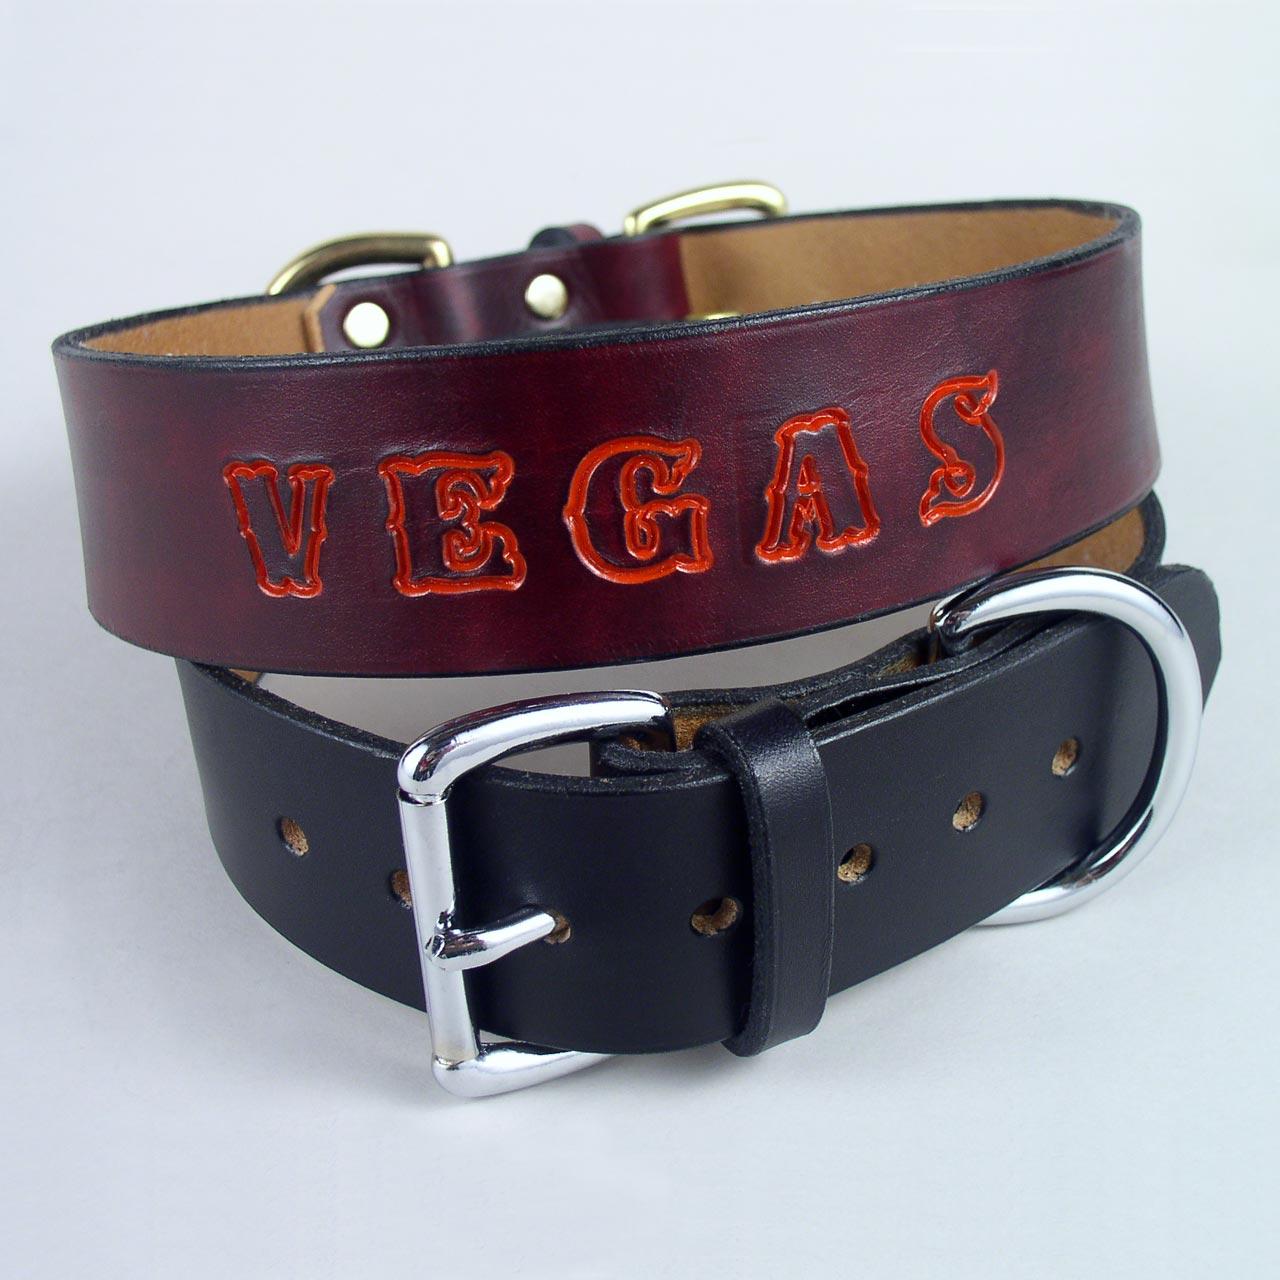 personalized dog collar gift idea.jpg